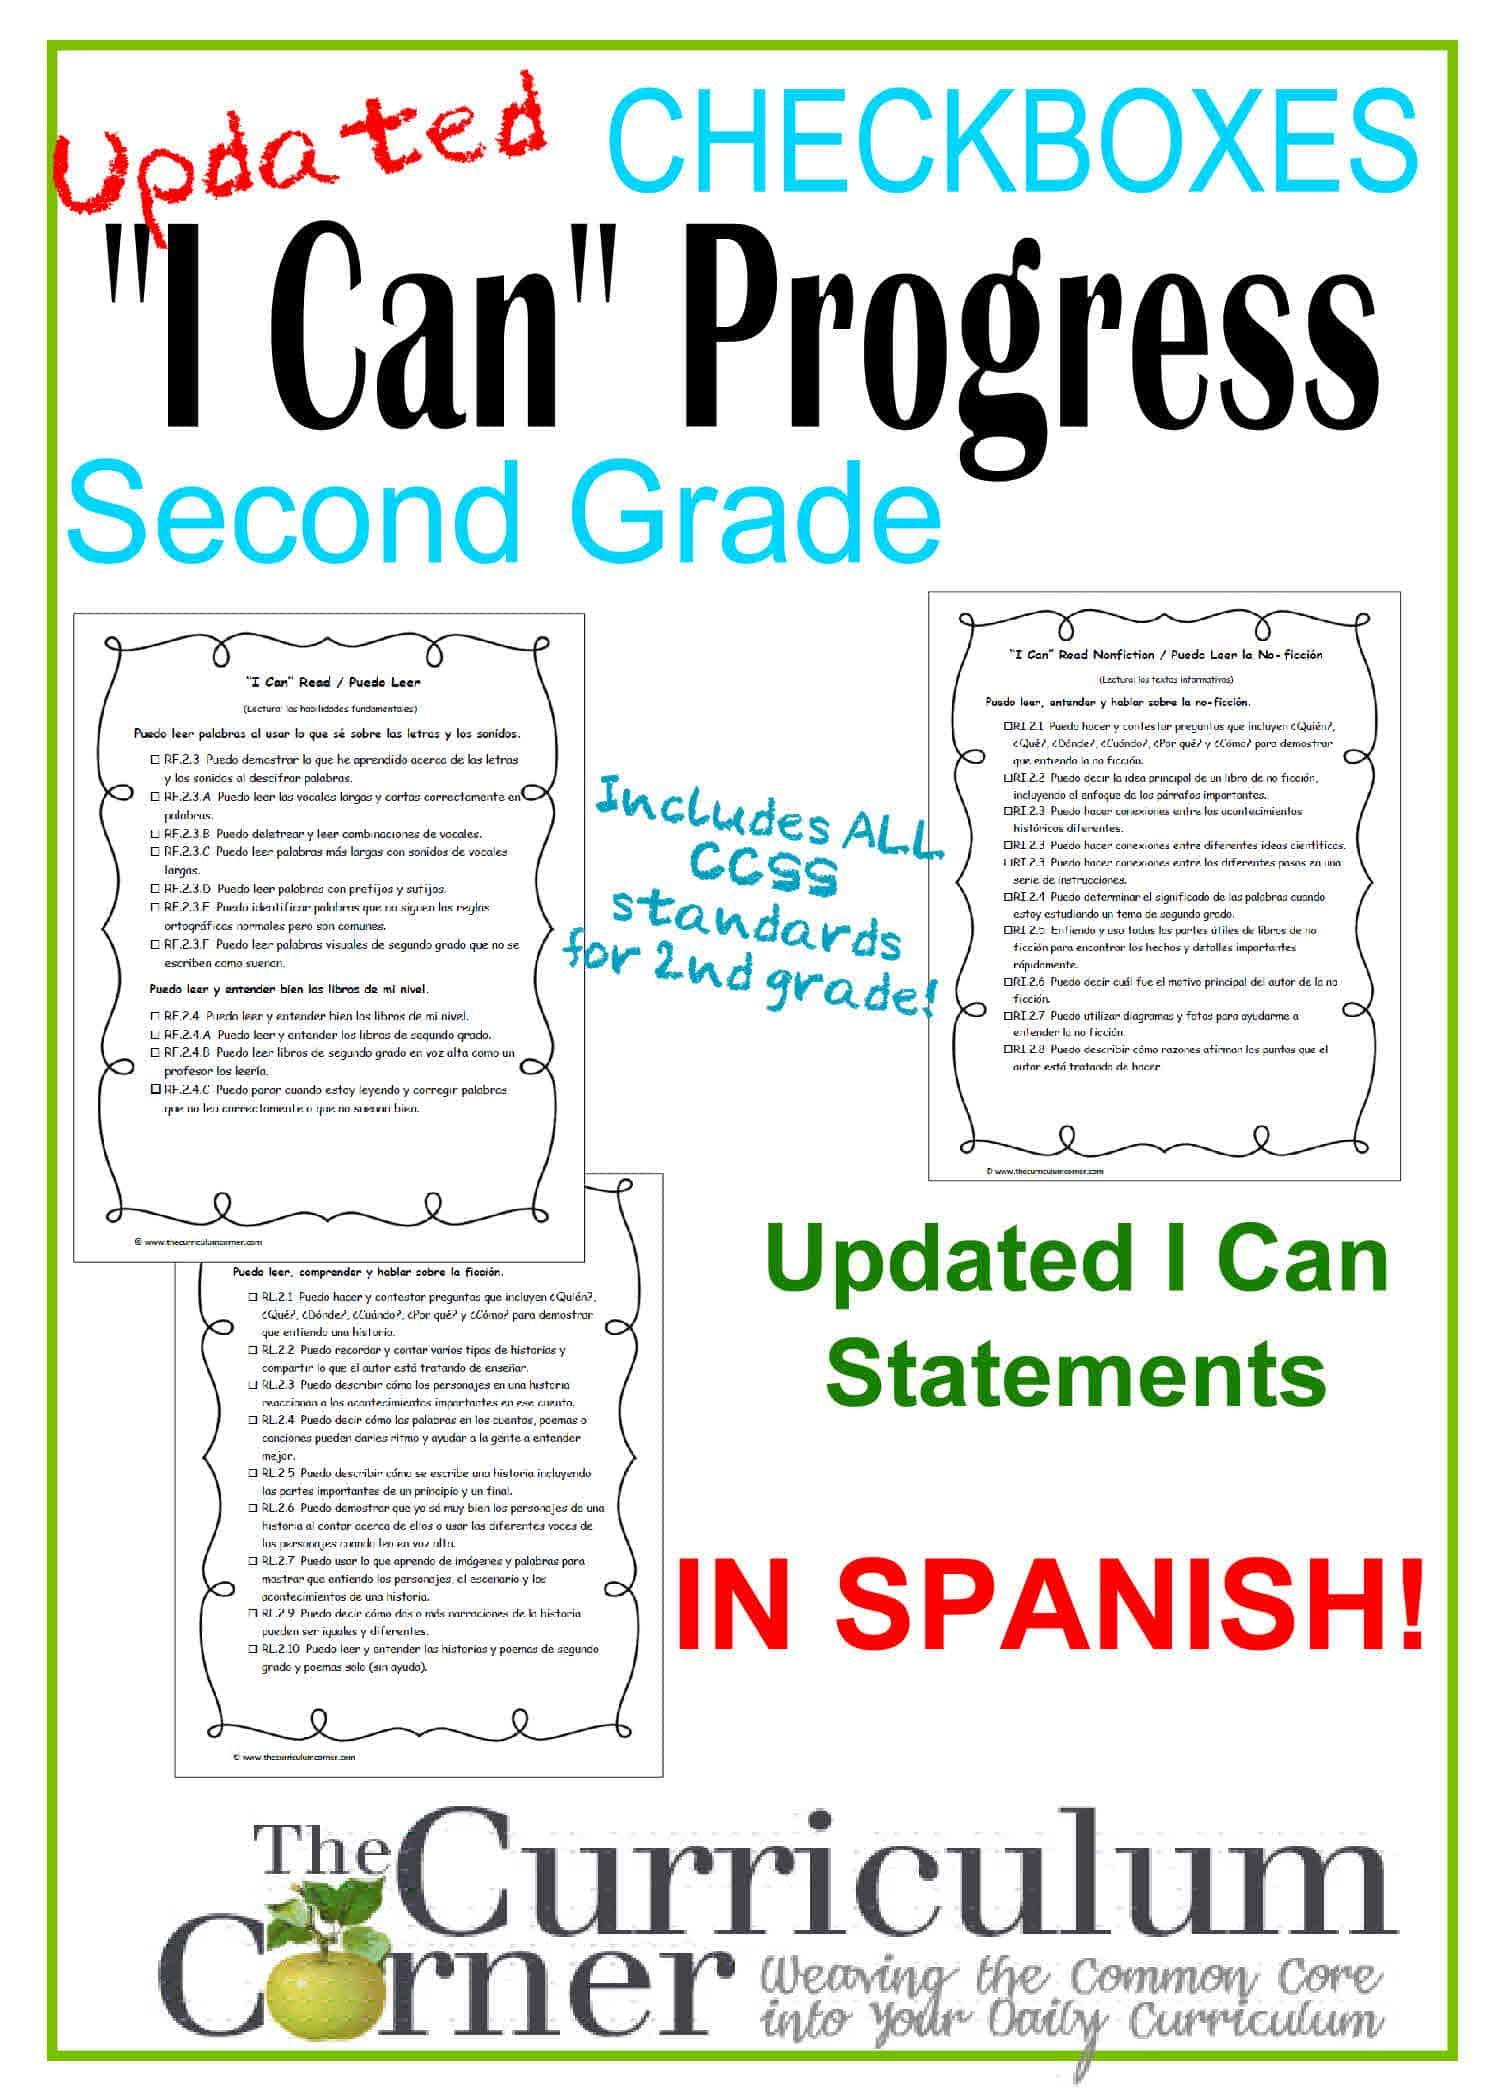 2nd Grade Spanish I Can Ccss Statement Progress